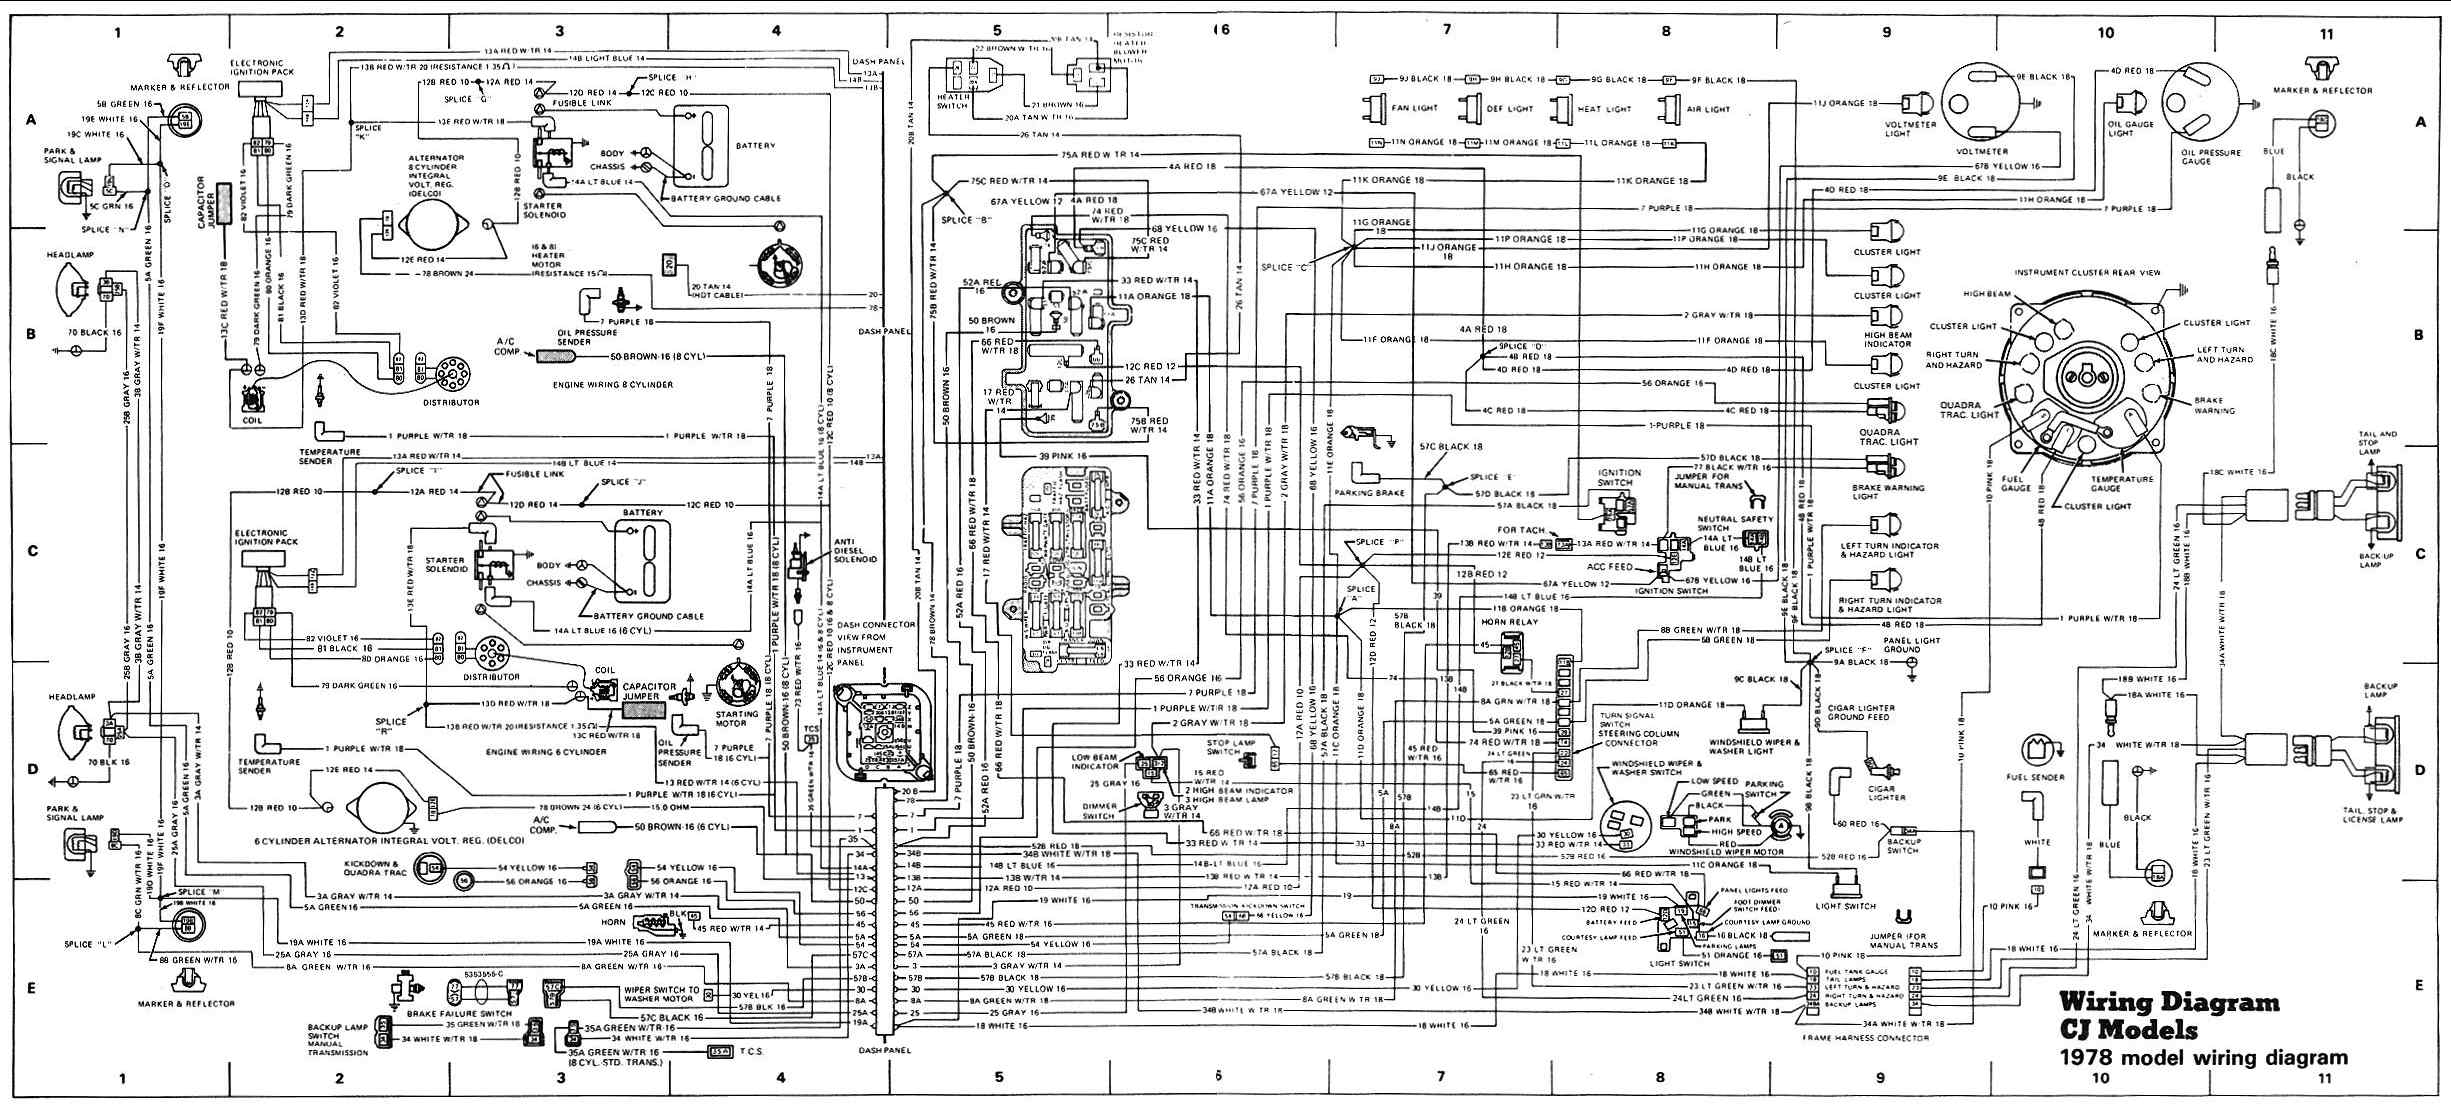 wiring diagram of 1978 jeep cj models?t=1508490323 jeep car manuals, wiring diagrams pdf & fault codes saab 93 wiring diagram download at cos-gaming.co